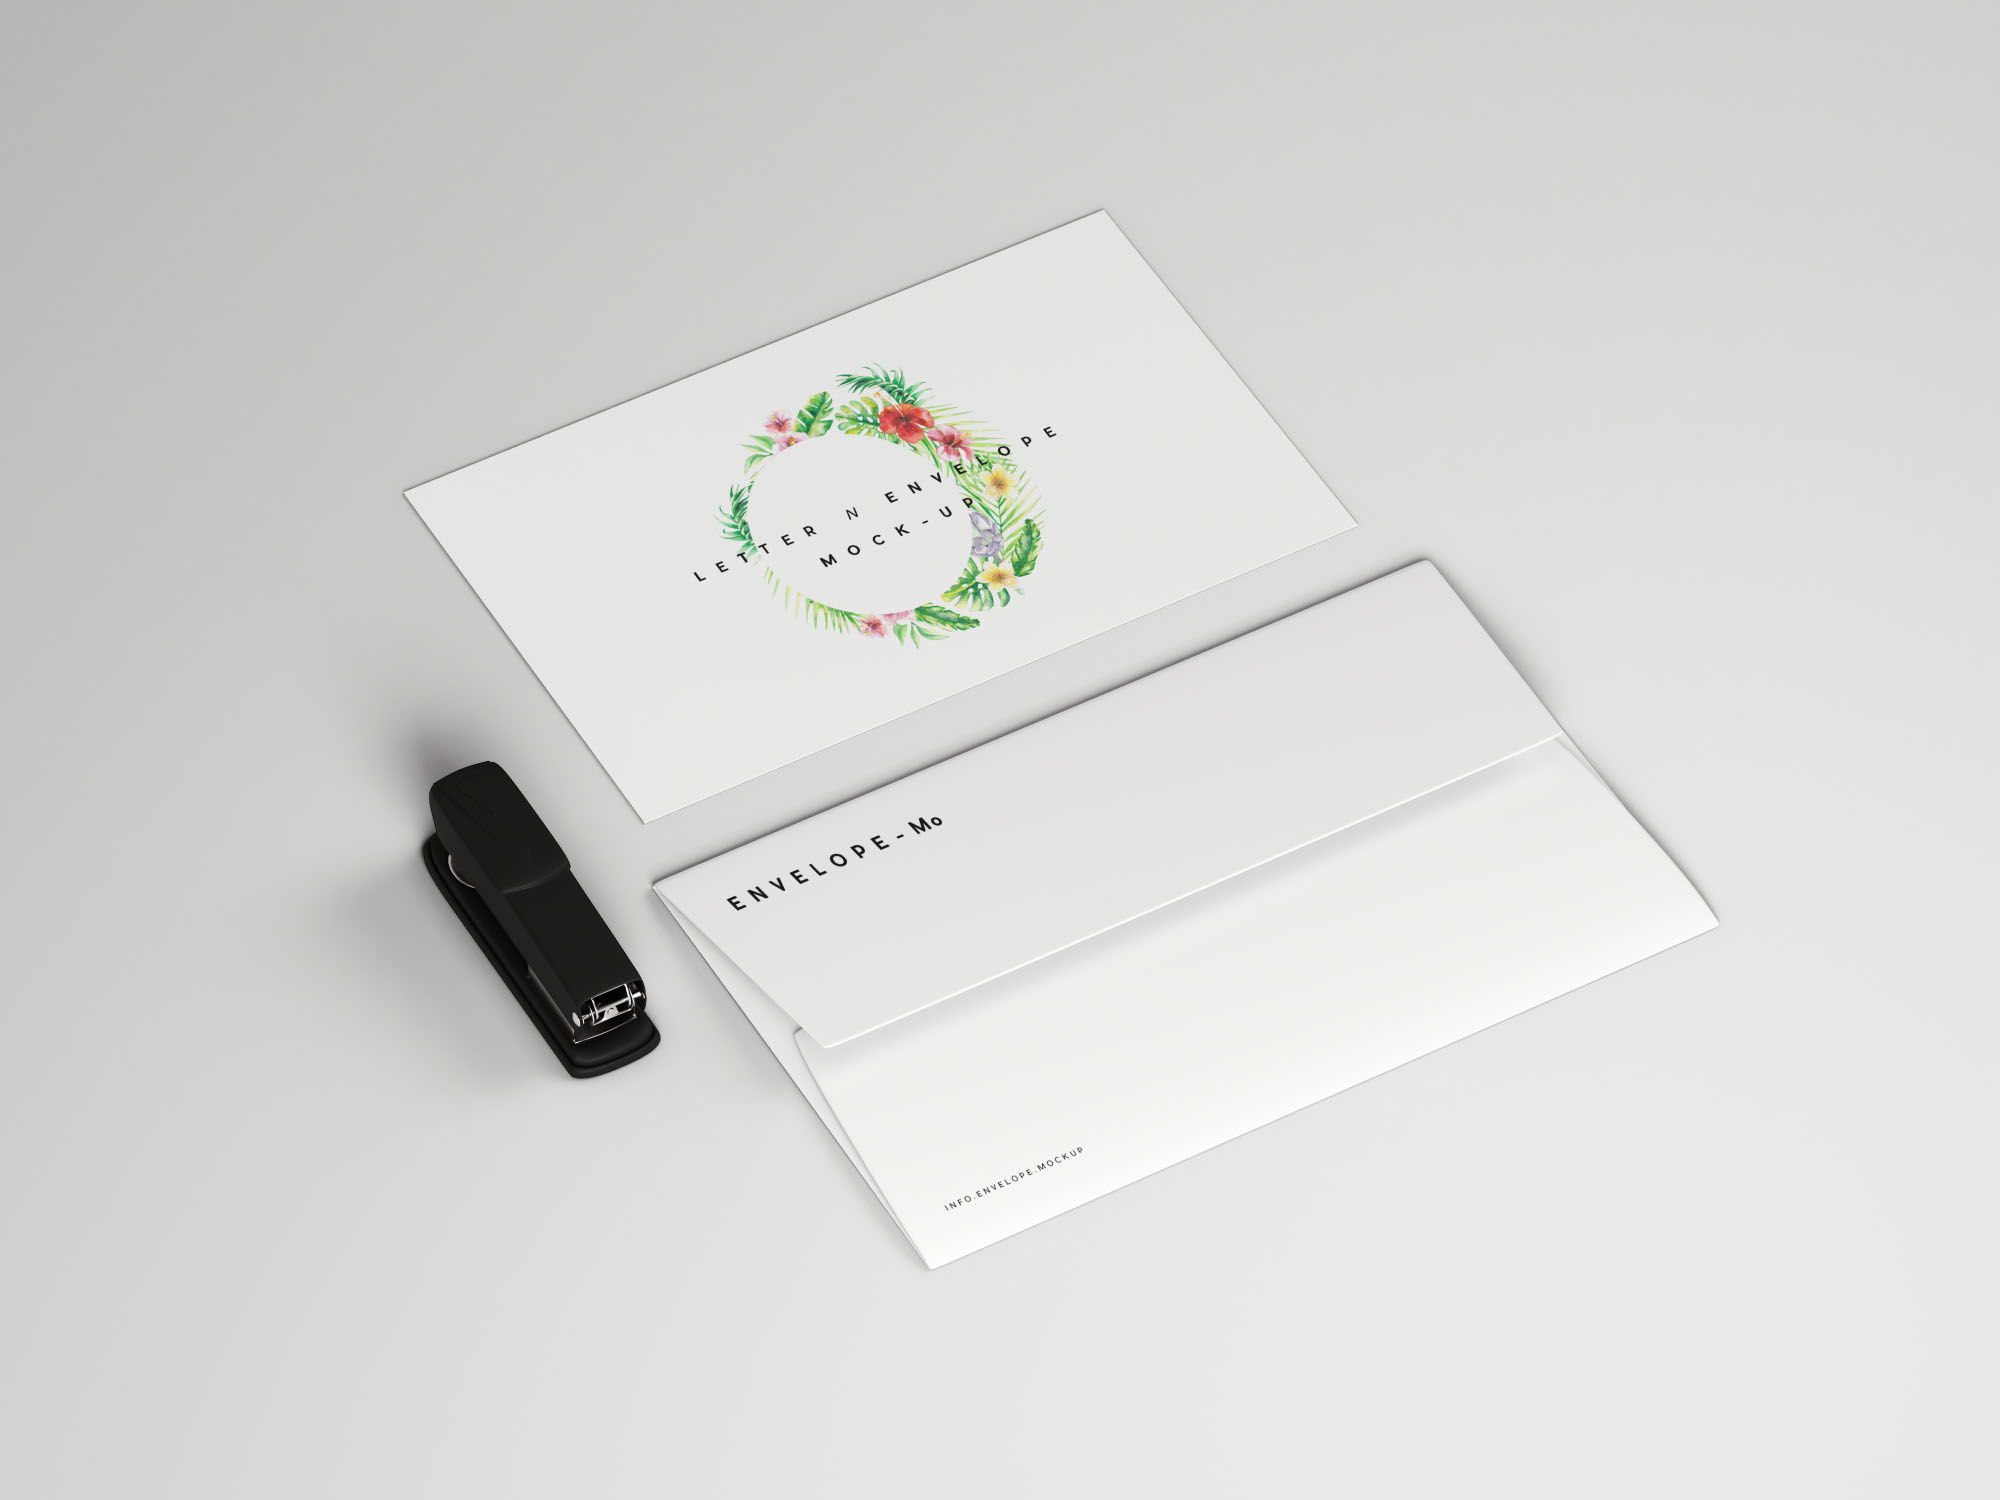 Free Envelope and Letter Mockup